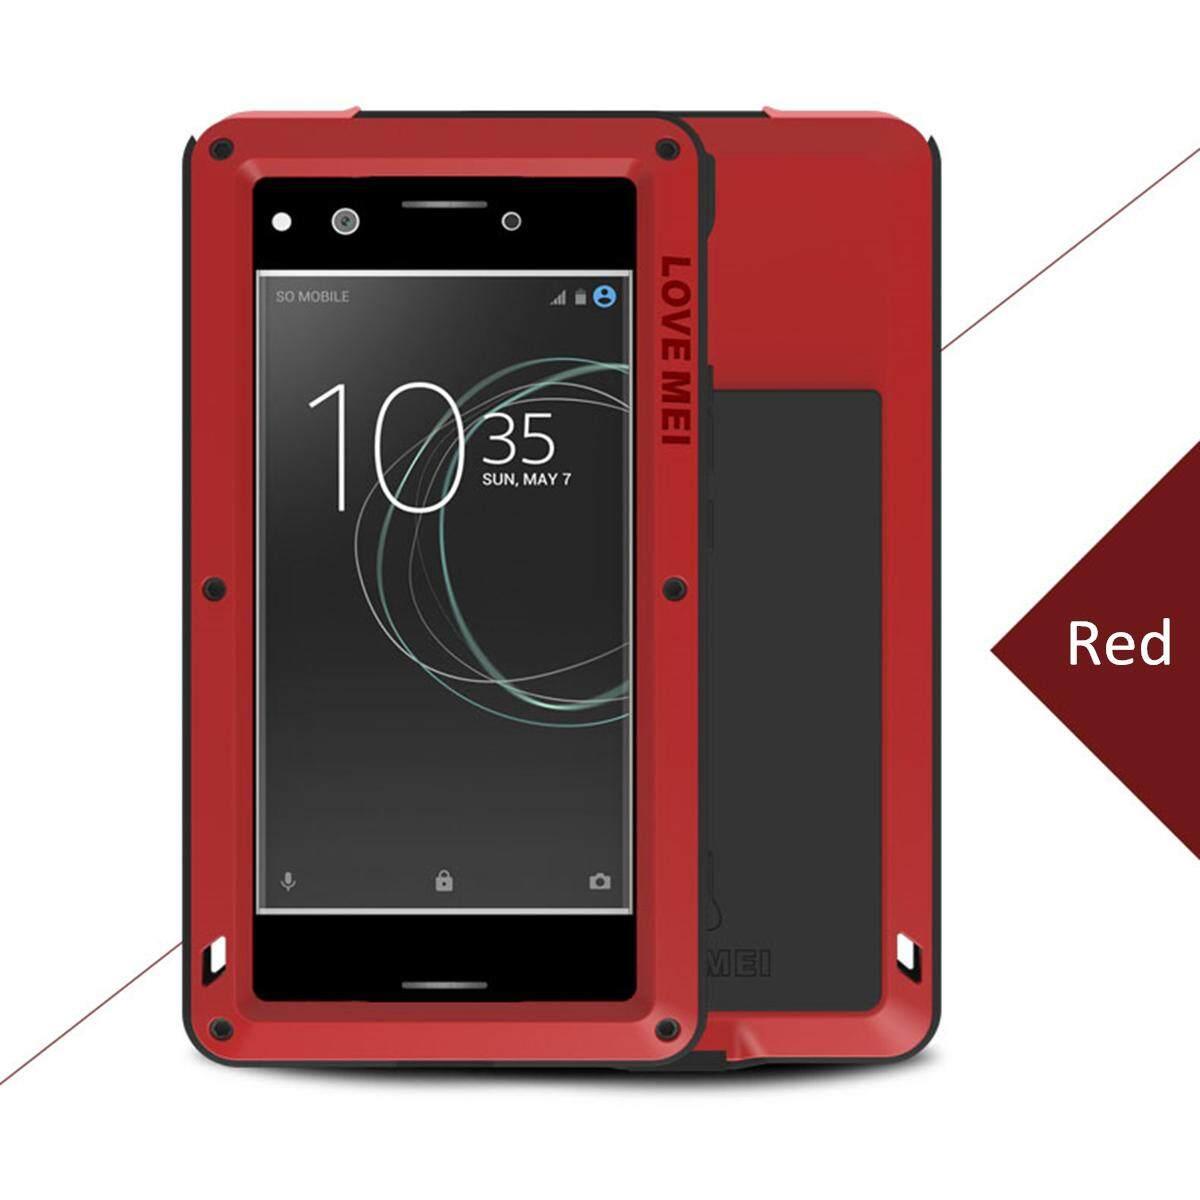 CINTA MEI Anti-Air Anti Guncangan Aluminium Logam Telepon Case untuk Sony Xperia XZ Premium Merah-Internasional